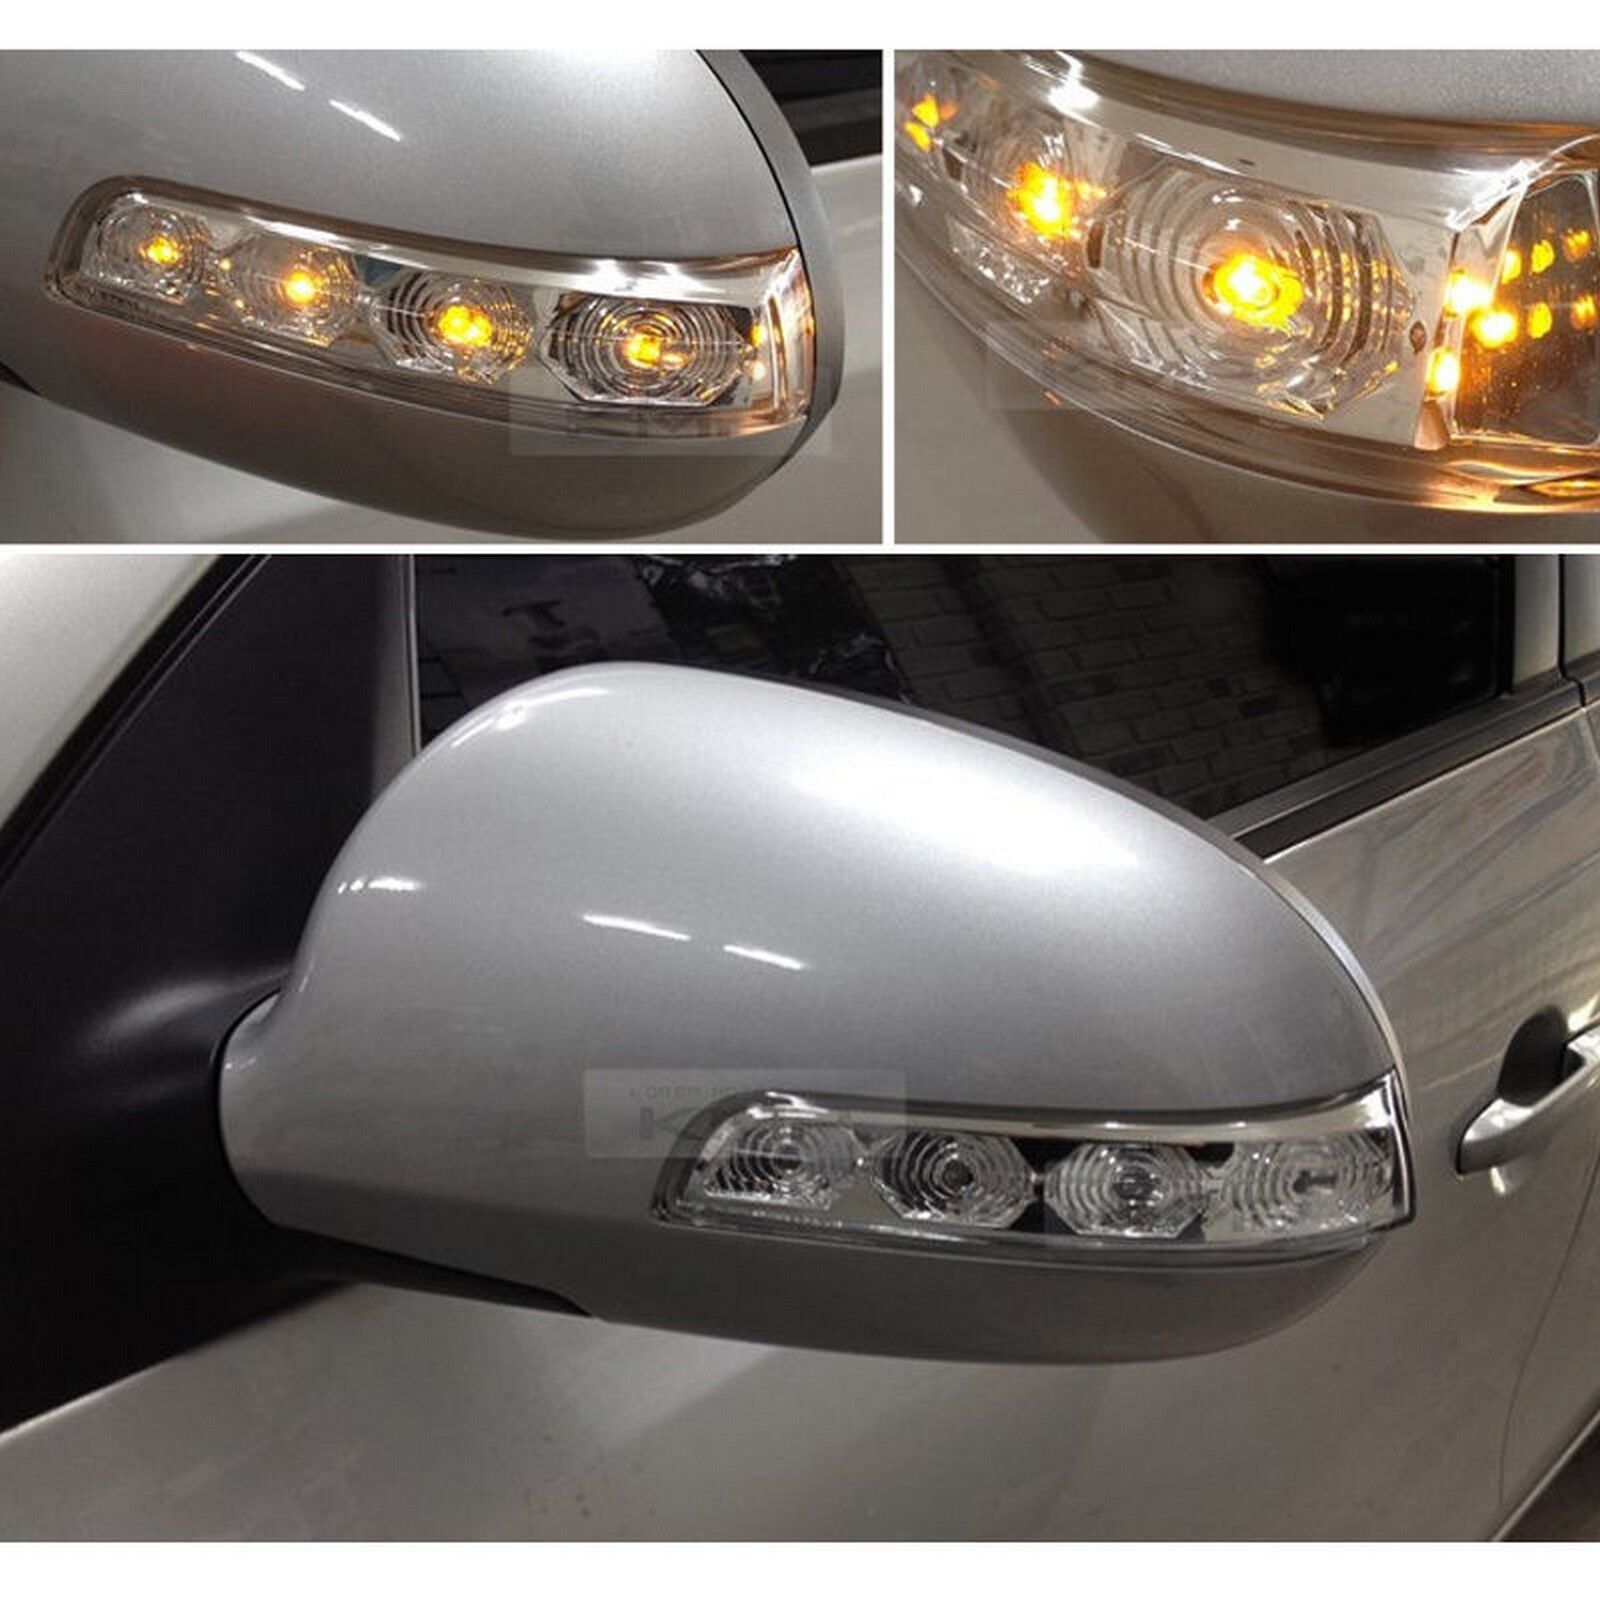 Ineedup Left and Right Exterior Mirror LED Lights Turn Signal Light Lenses Fit for 2008 2009 2010 2011 2012 2013 2014 2015 2016 F250 F350 F450 F550 Super Duty Light Bulb Smoke Lenses